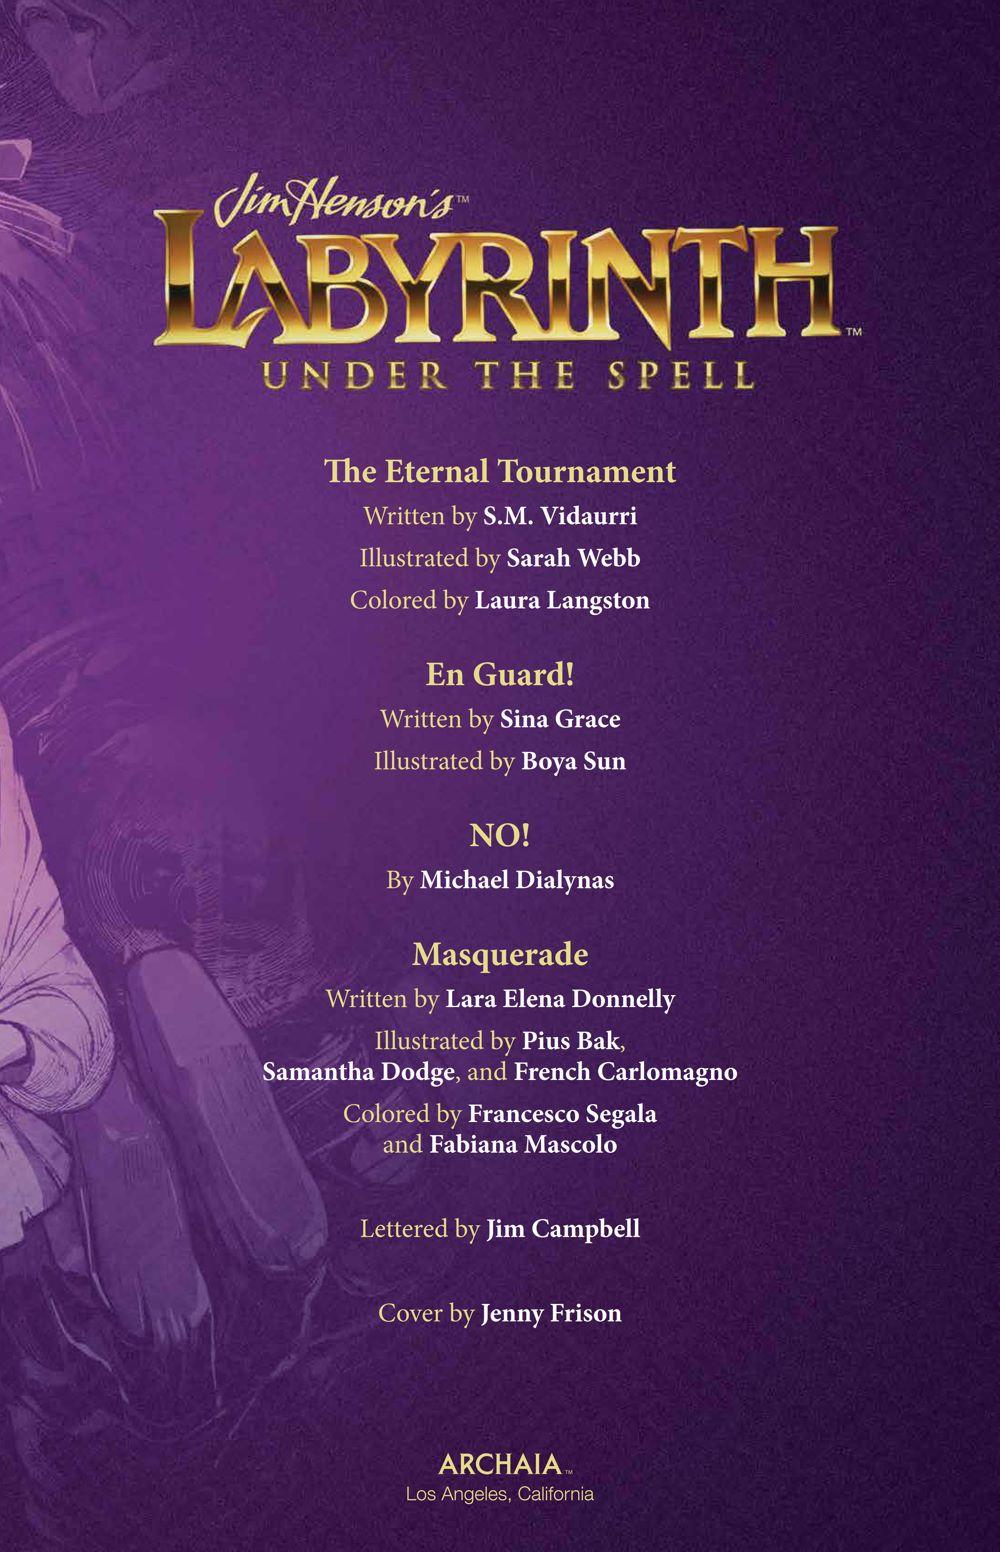 Labyrinth_UnderSpell_HC_PRESS_7 ComicList Previews: JIM HENSON'S LABYRINTH UNDER THE SPELL HC